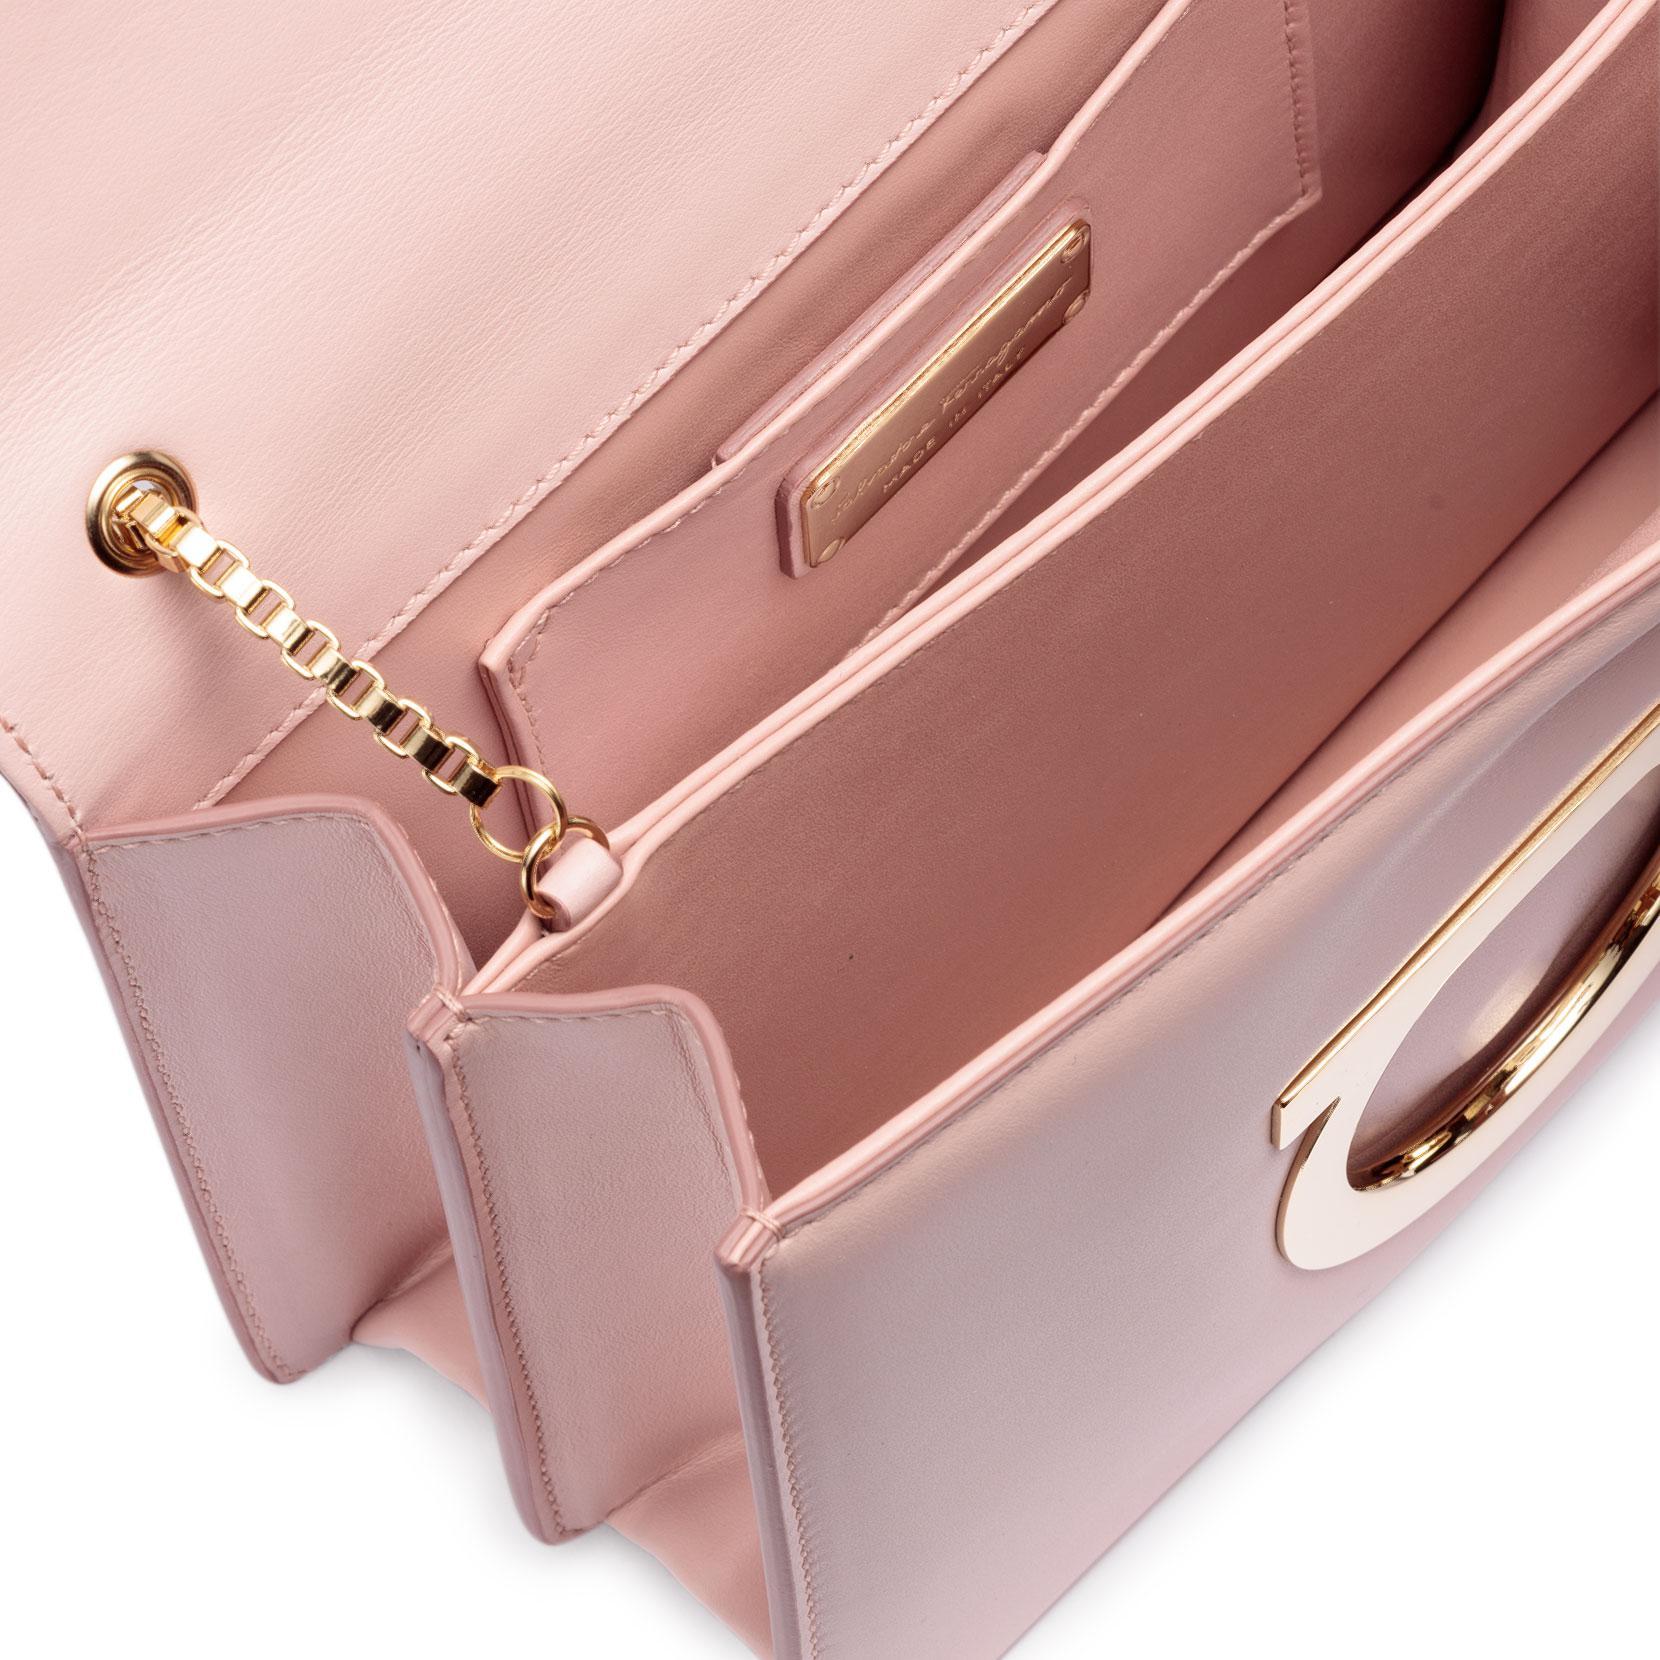 Thalia light pink leather Gancini shoulder bag Salvatore Ferragamo Discount 100% Original Discount Genuine On Hot Sale 83RzIC